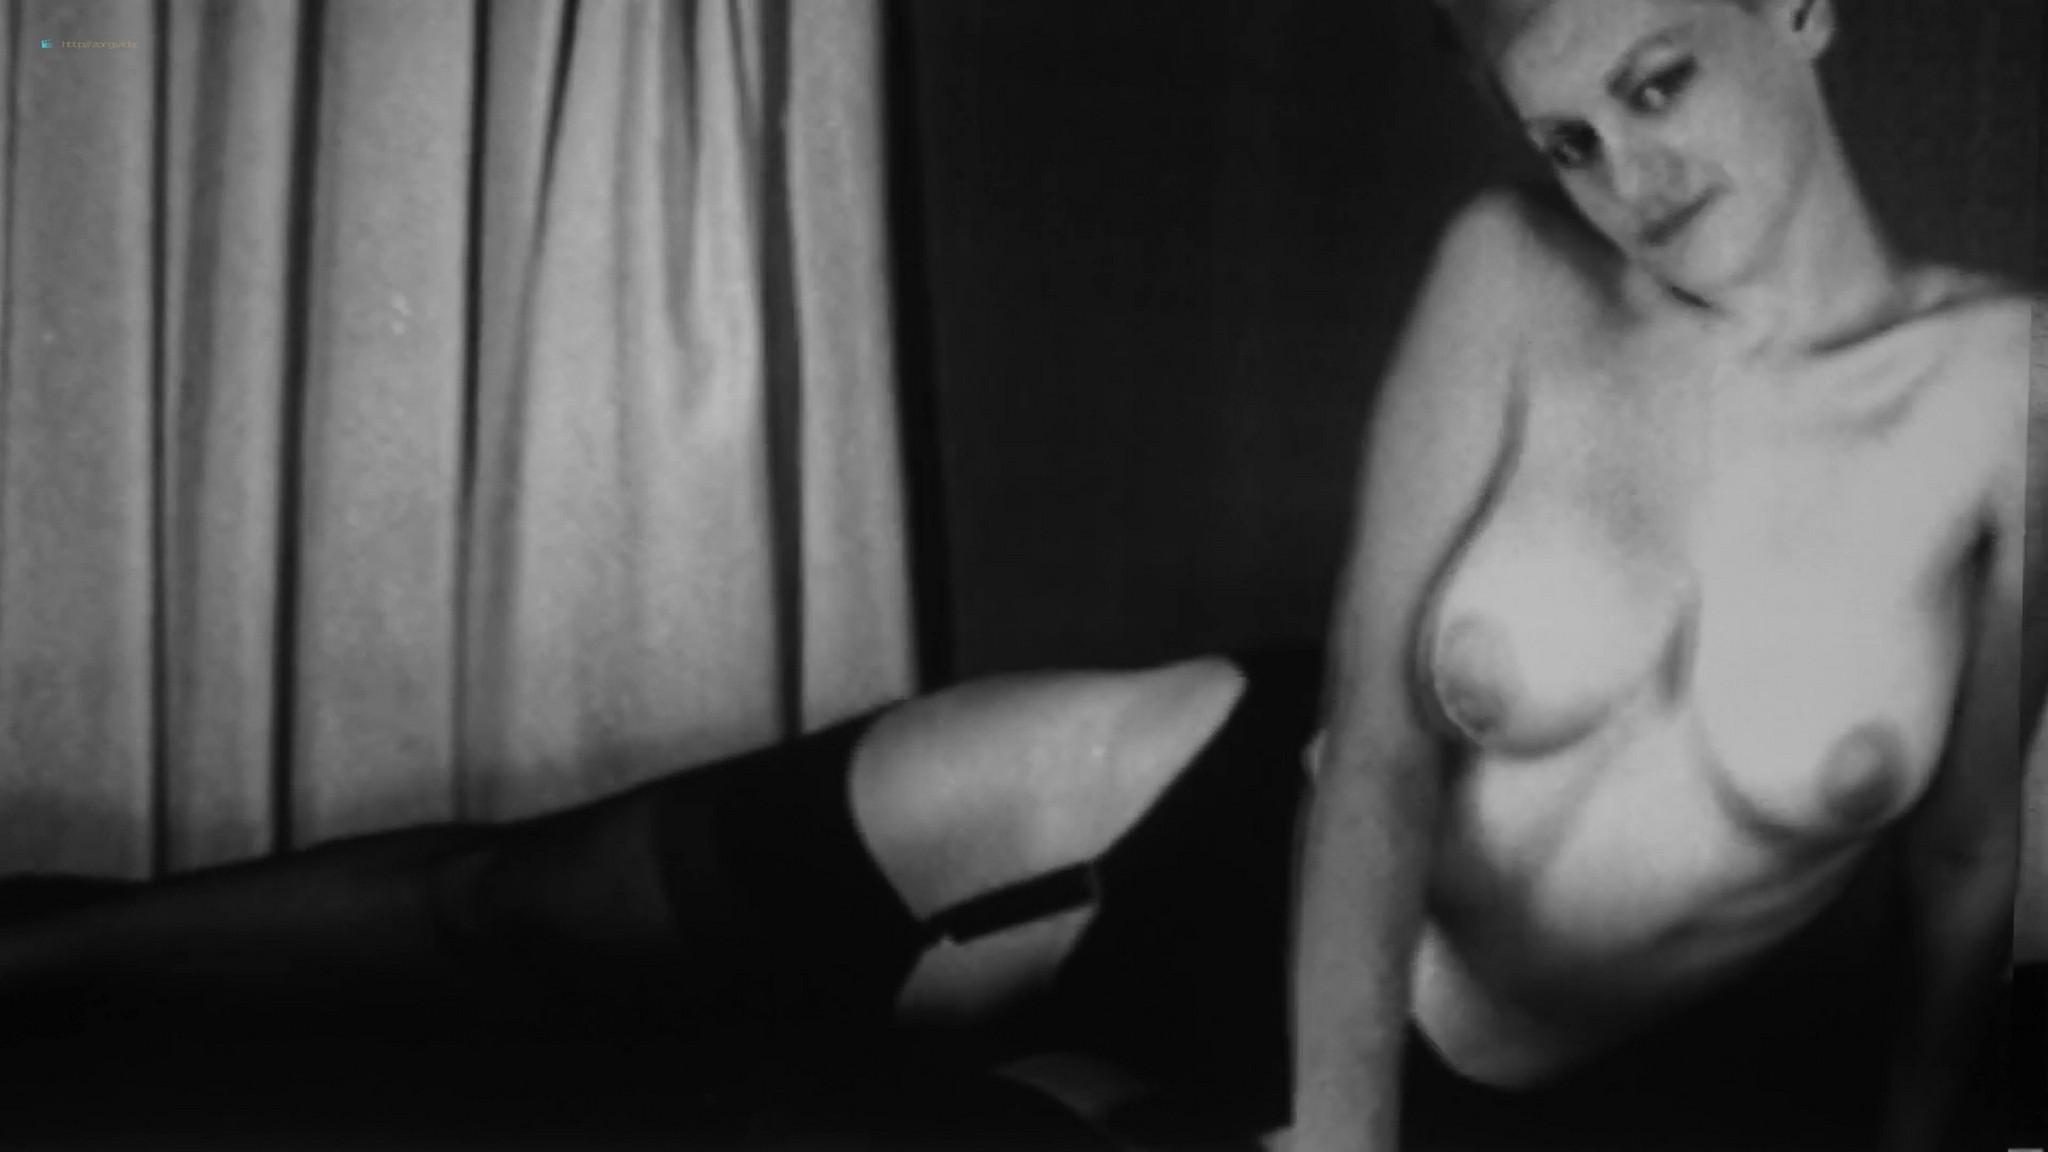 Ella Stryker nude Jeannie Ramirez and others sex nude too - Joel (2018) HD 1080p Web (9)